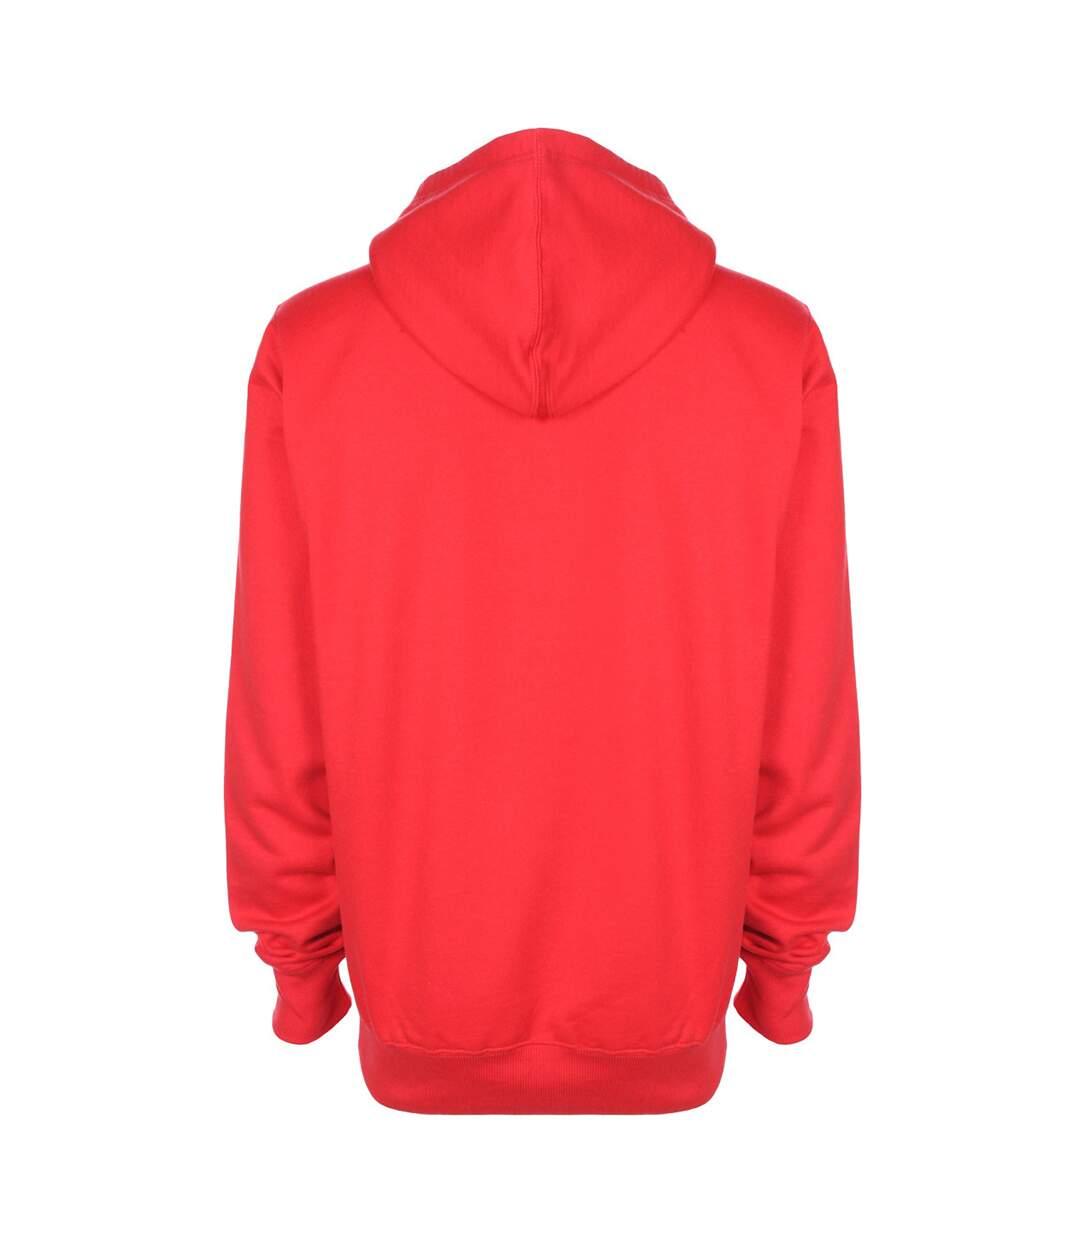 FDM Unisex Plain Original Hooded Sweatshirt / Hoodie (300 GSM) (Fire Red) - UTBC2024